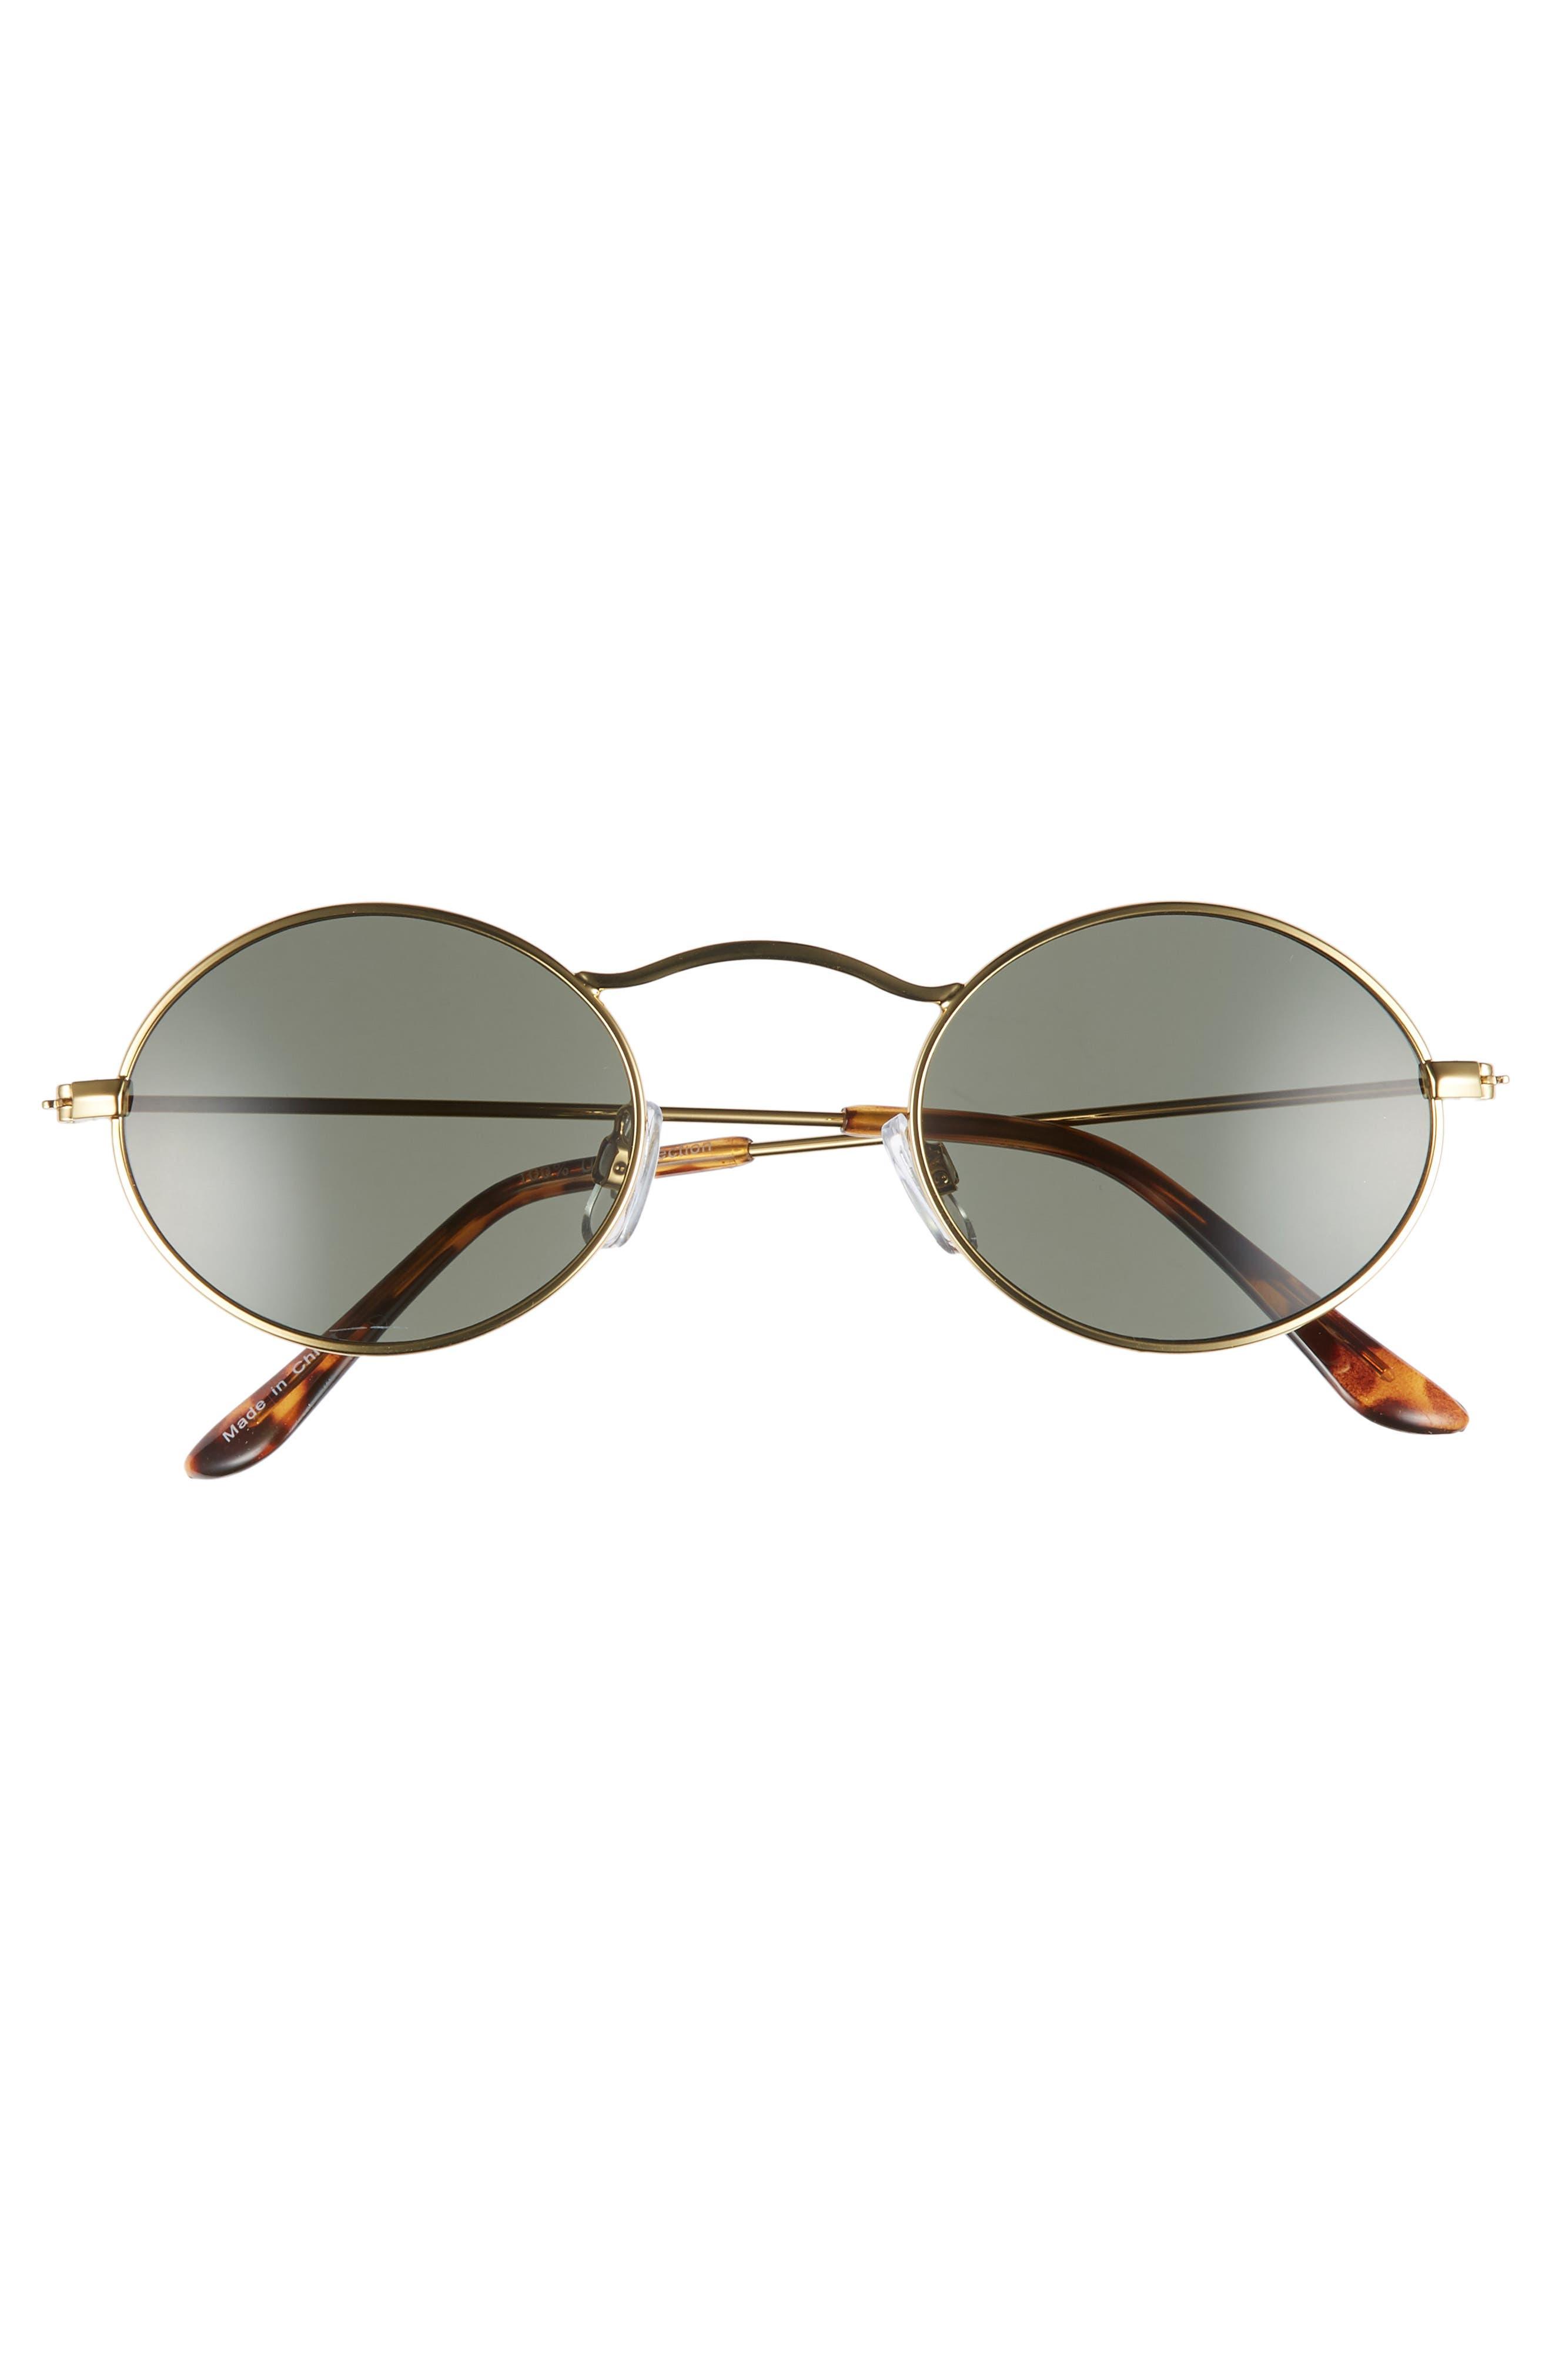 48mm Small Oval Sunglasses,                             Alternate thumbnail 3, color,                             GOLD/ BLACK